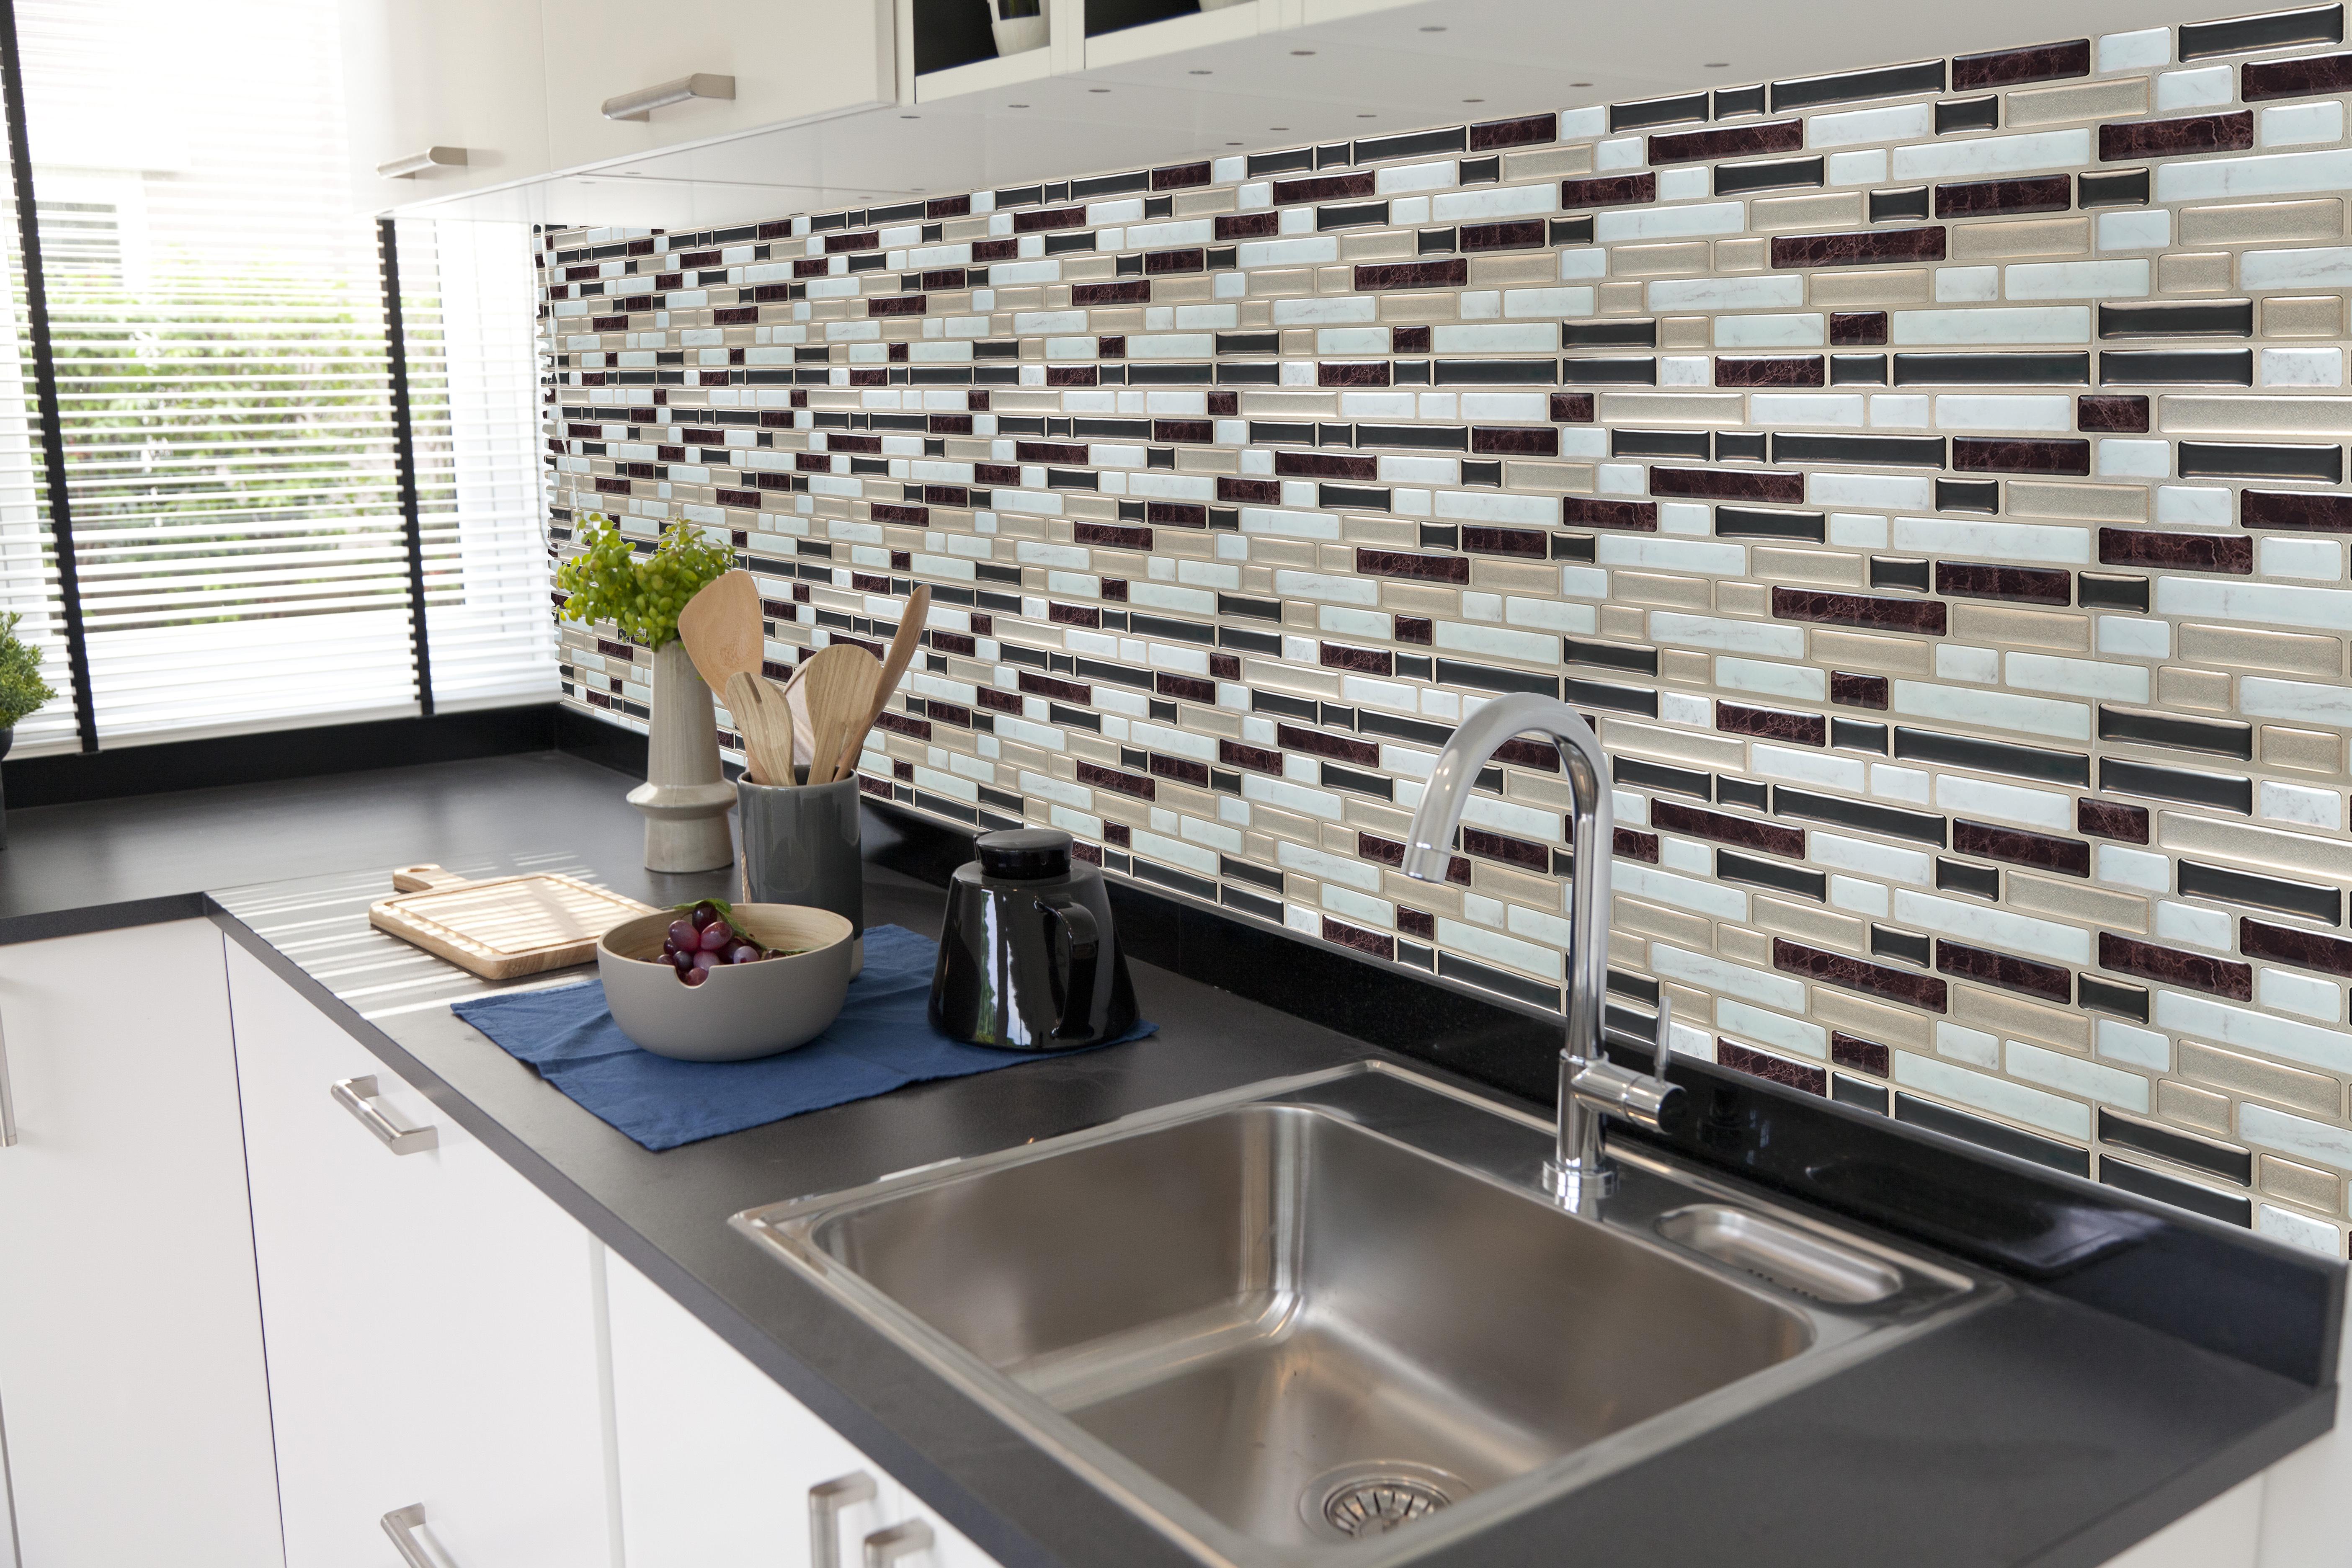 selbstklebende vinyl mosaik 3d fliesen wandgestaltung fliesen aufkleber klebe ebay. Black Bedroom Furniture Sets. Home Design Ideas